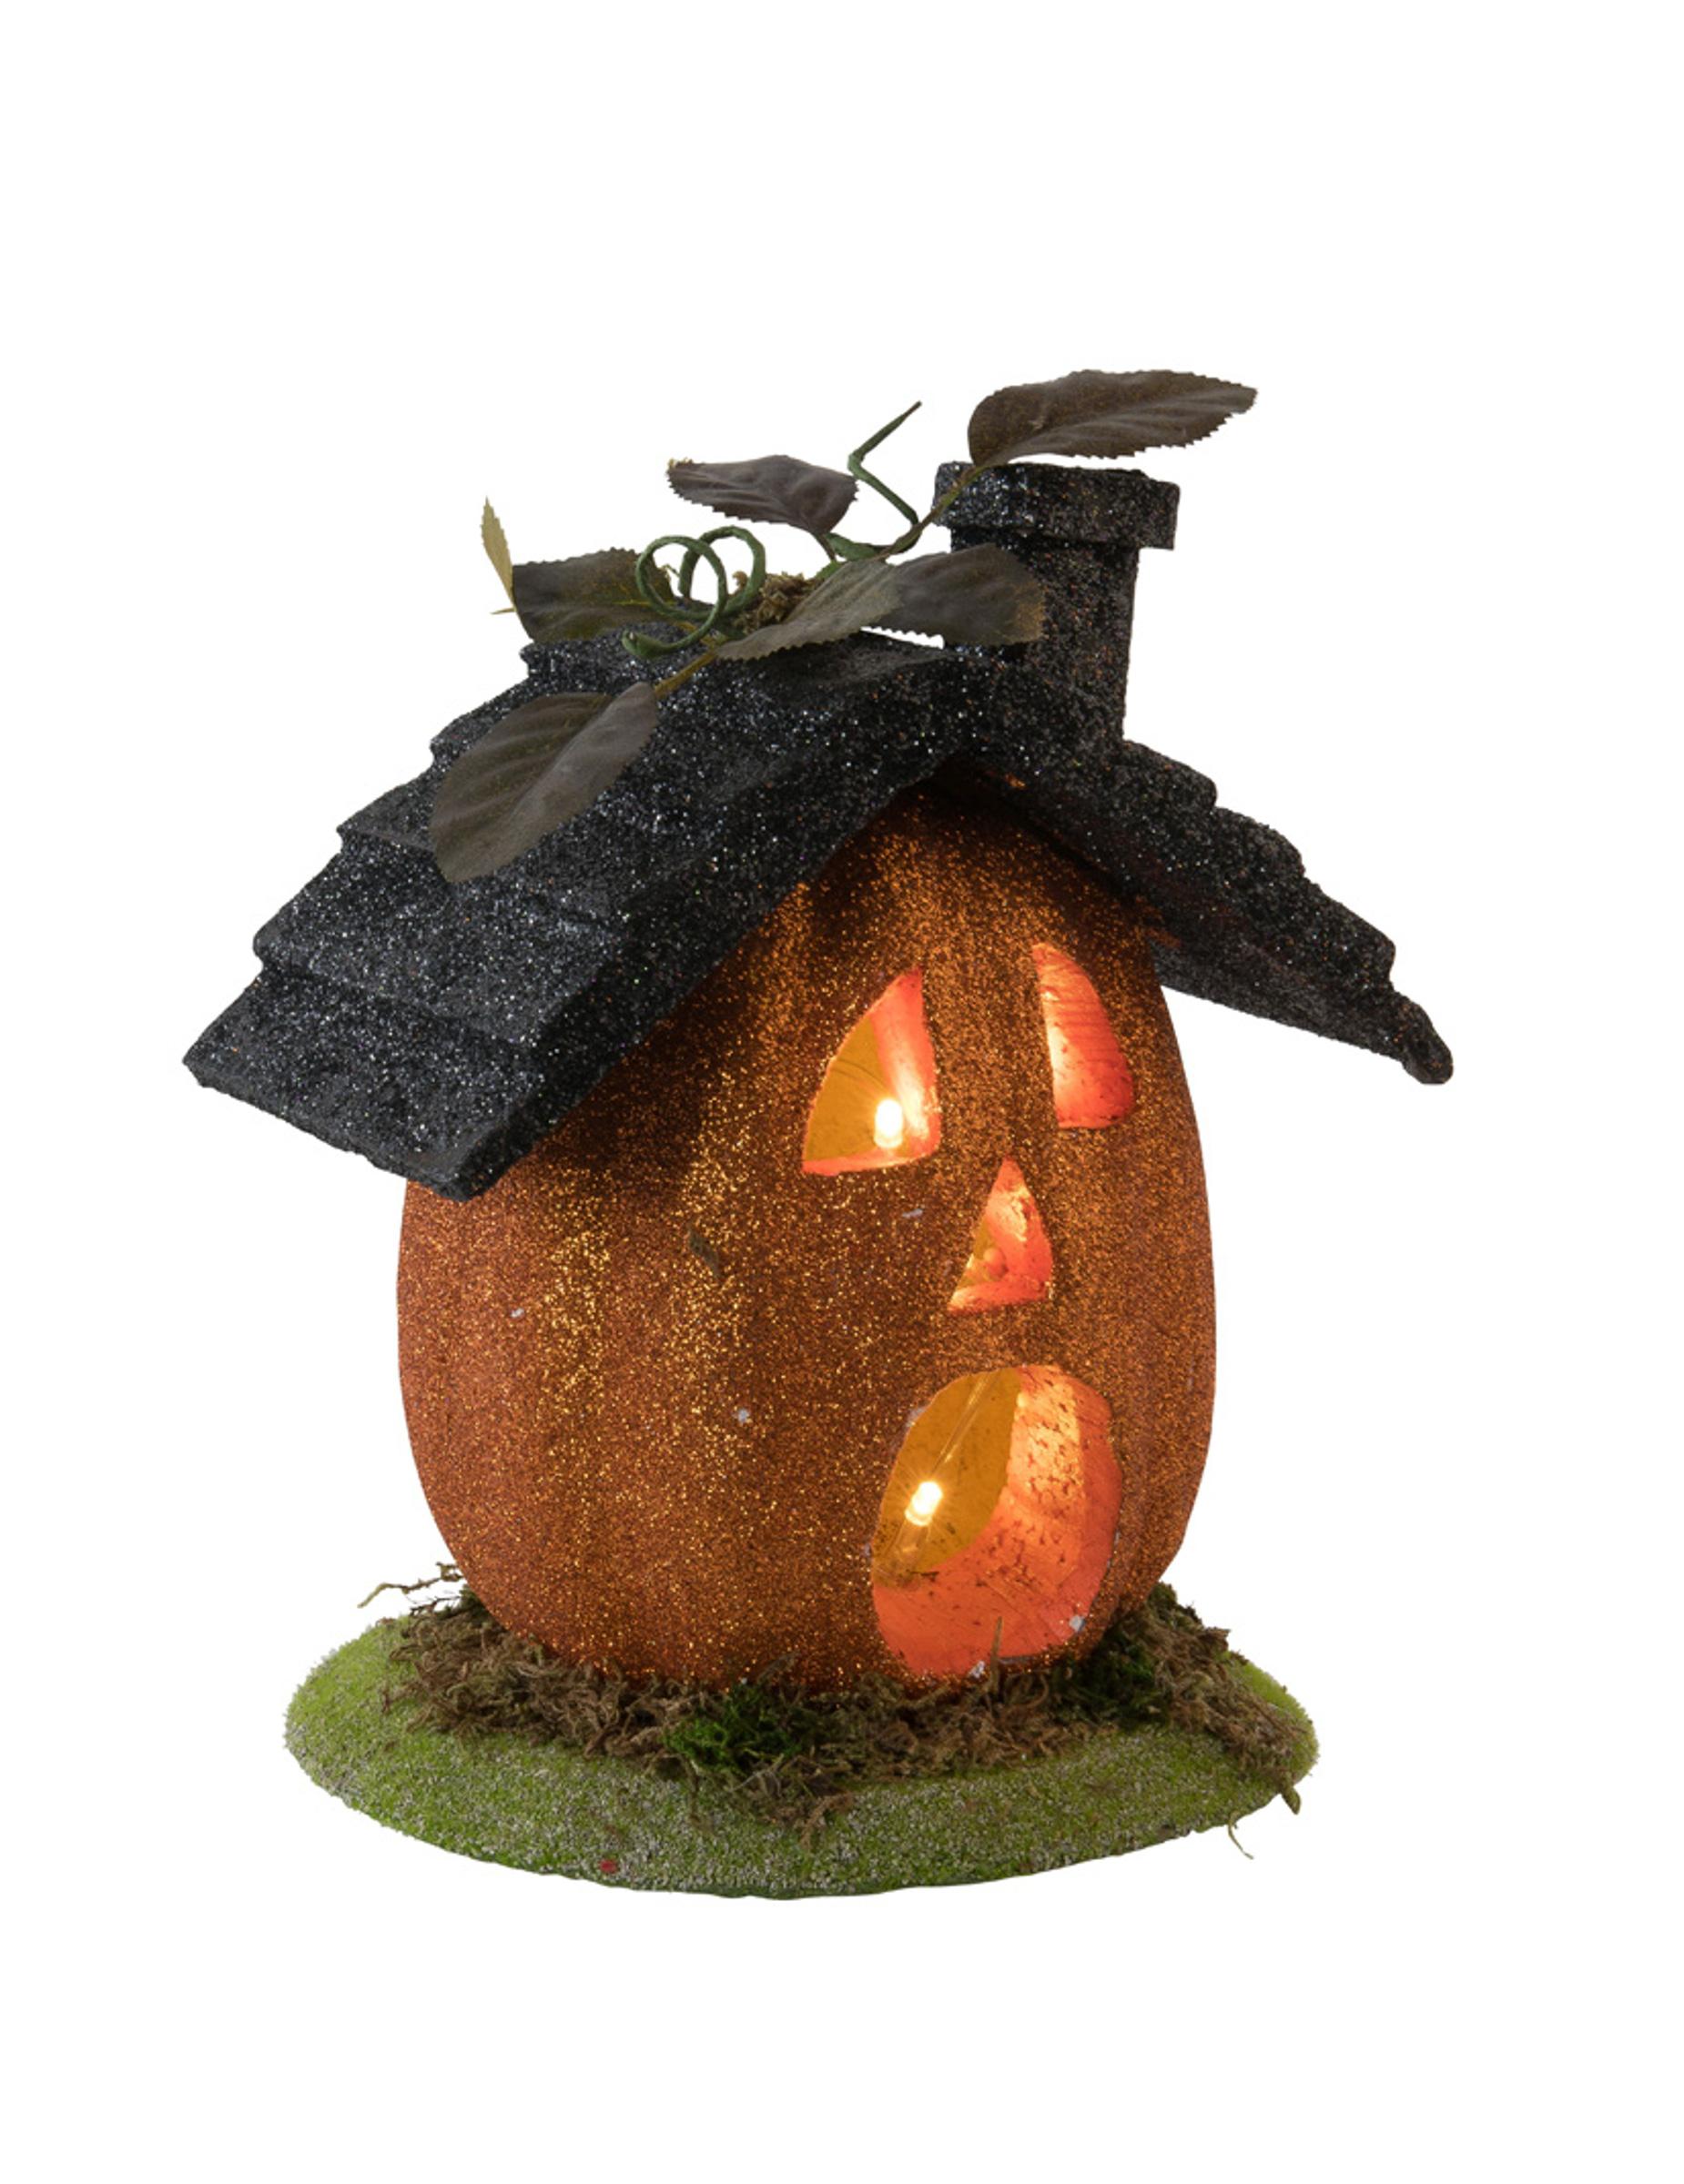 Maison Citrouille Lumineuse Halloween 23 Cm Deguise Toi Achat De